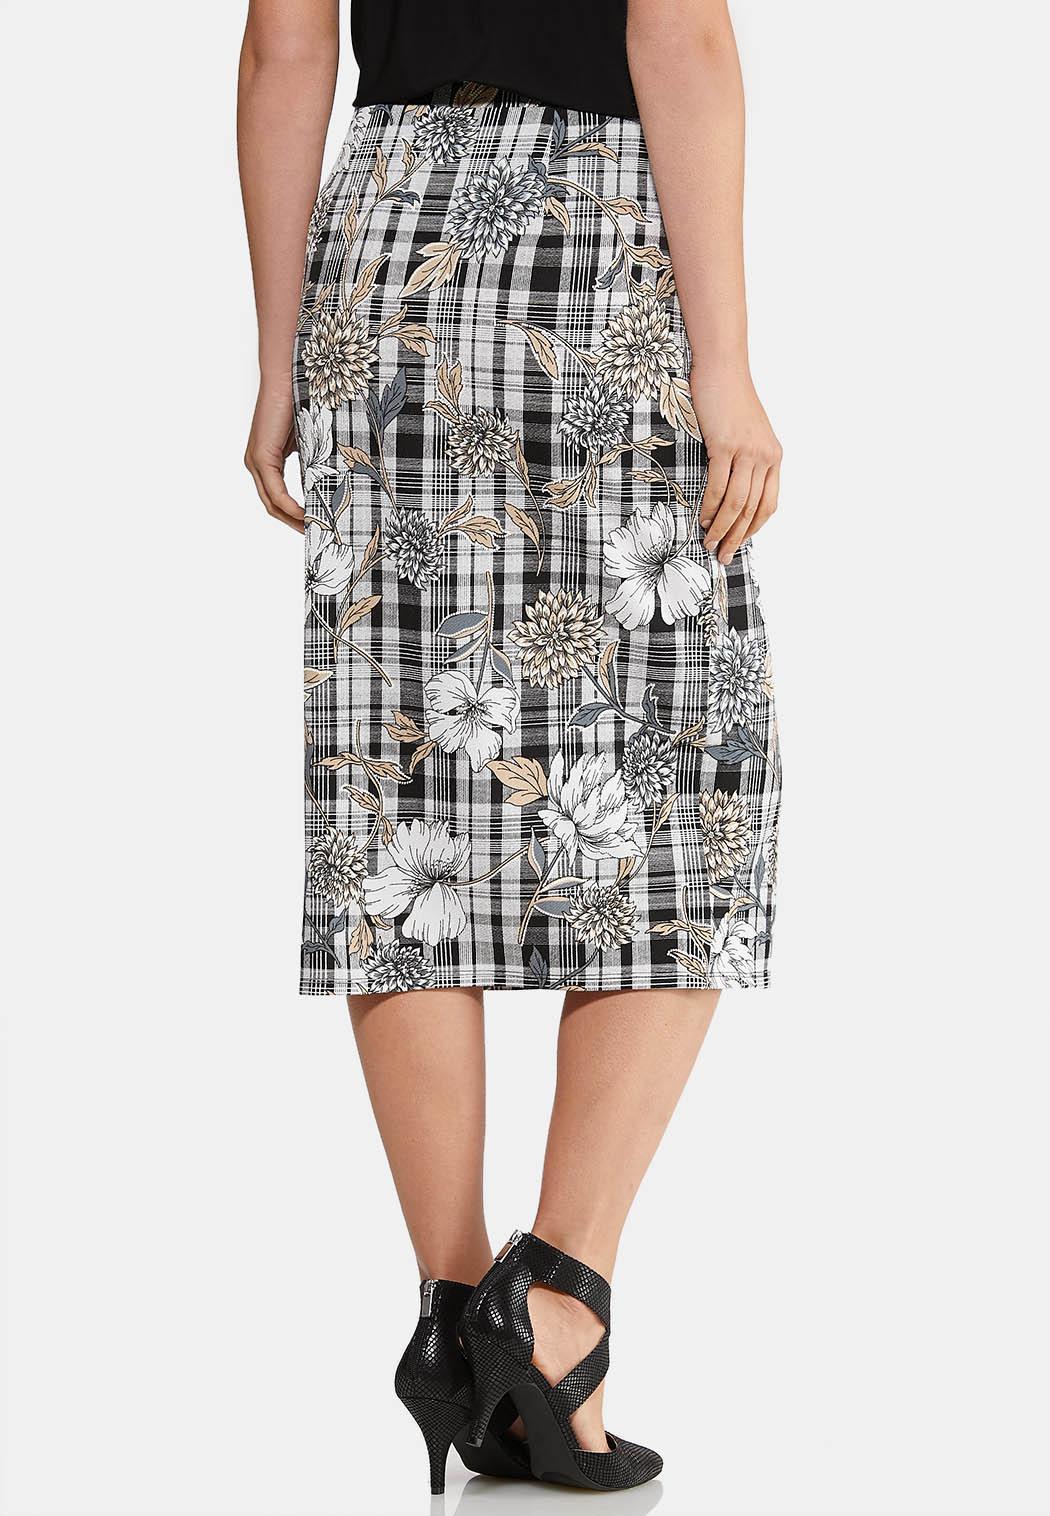 Floral Plaid Puff Skirt (Item #43956705)